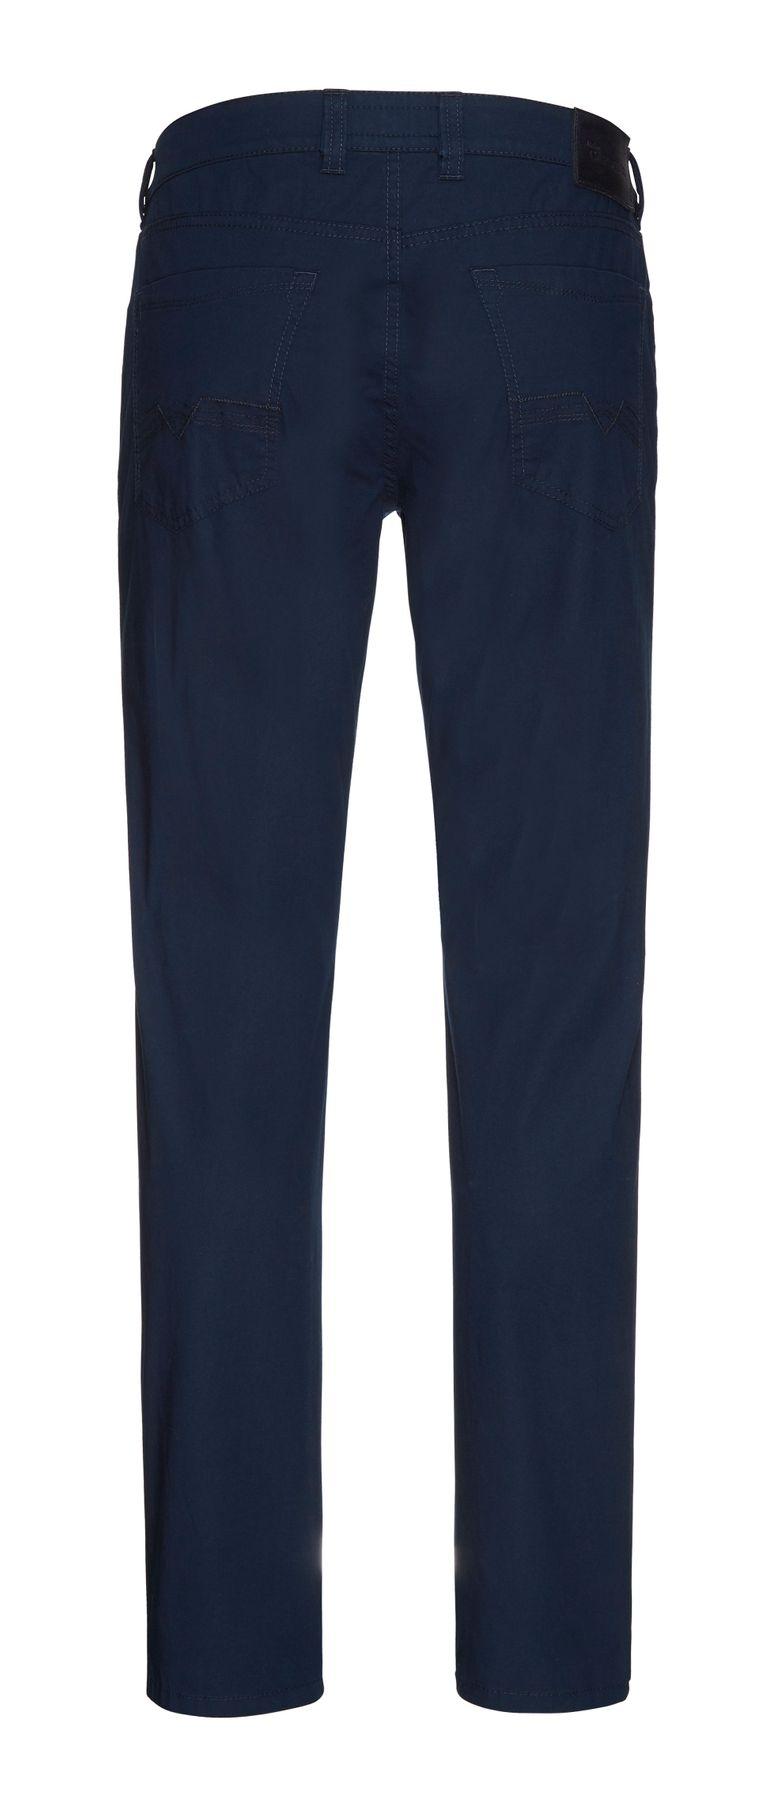 Atelier Gardeur - Modern Fit - Herren 5-Pocket Jeans, Bill-11K (410031) – Bild 9